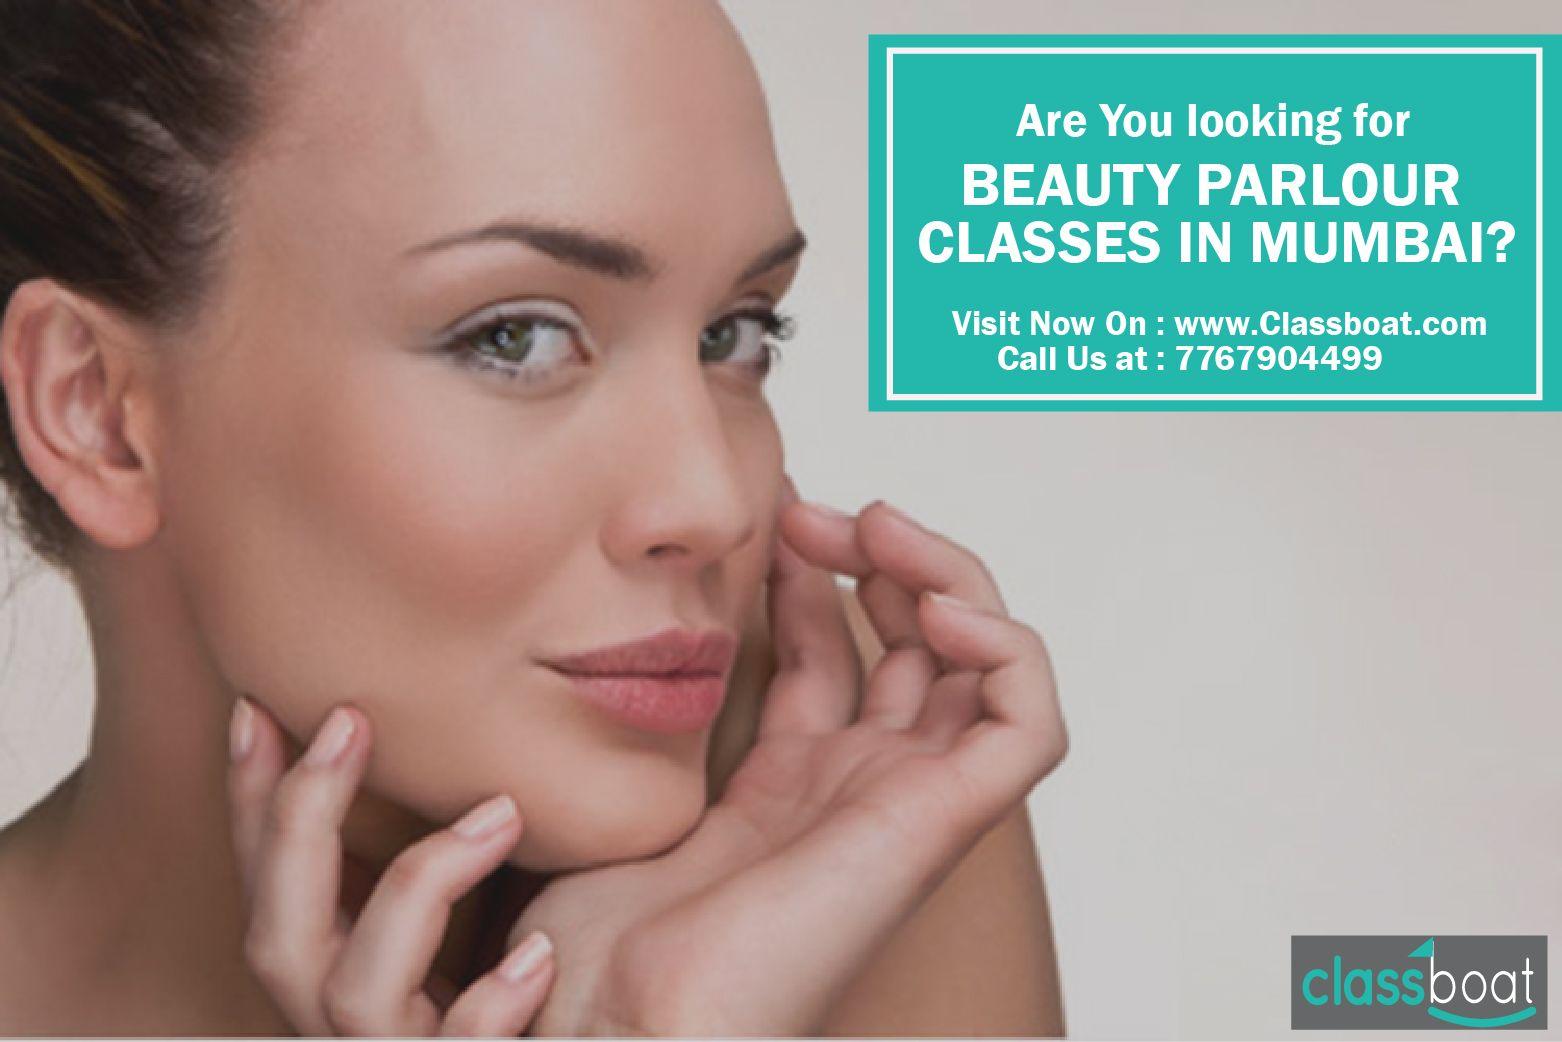 ClassBoat provides list of beauty parlour classes in